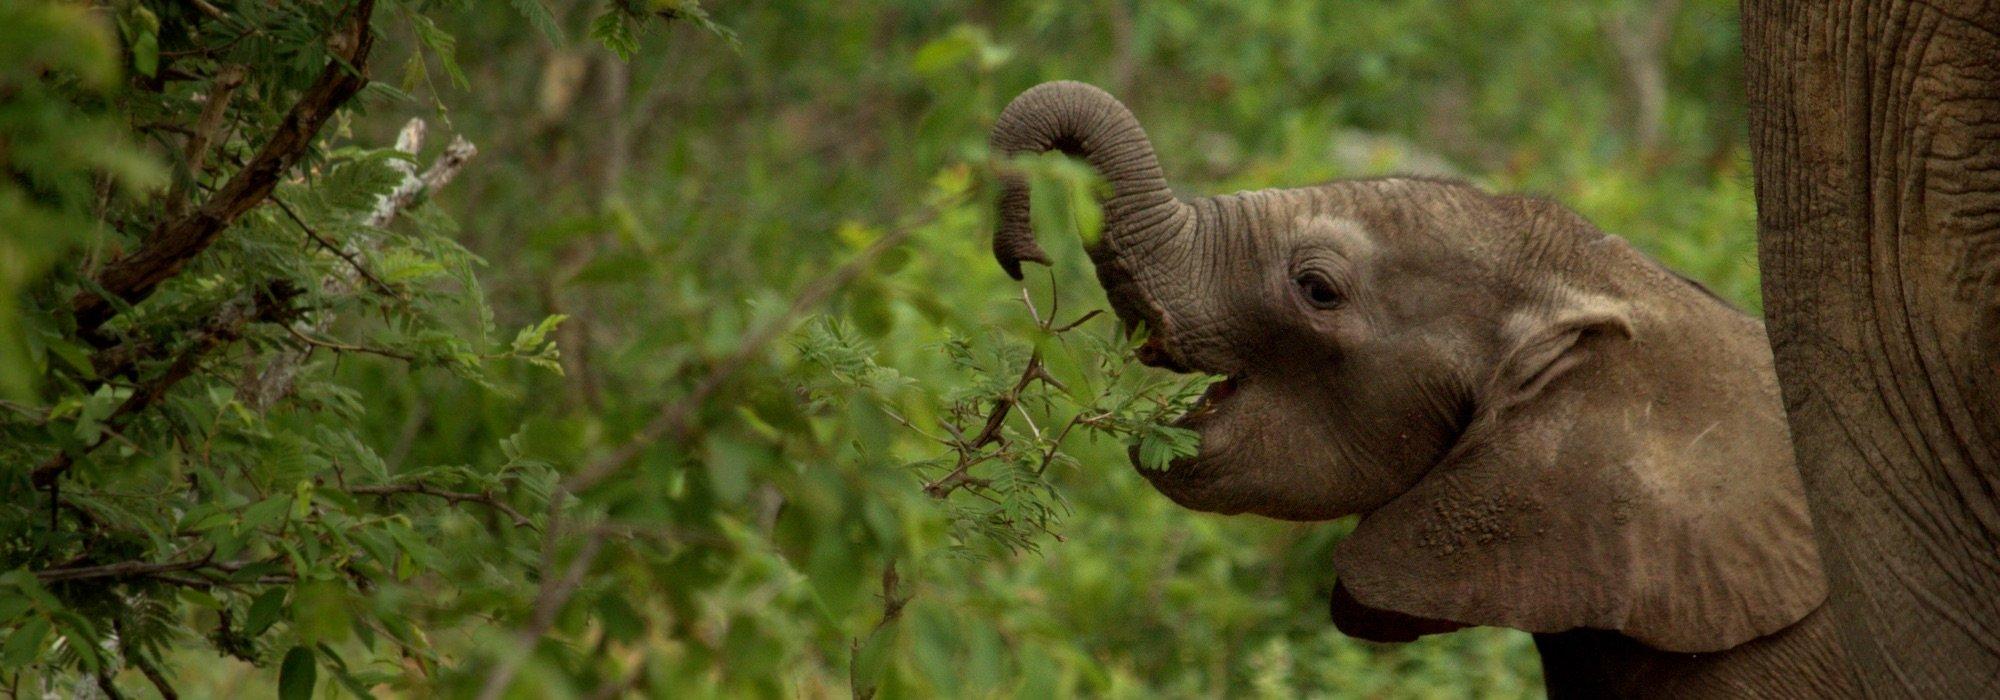 Baby elephant at Kapama